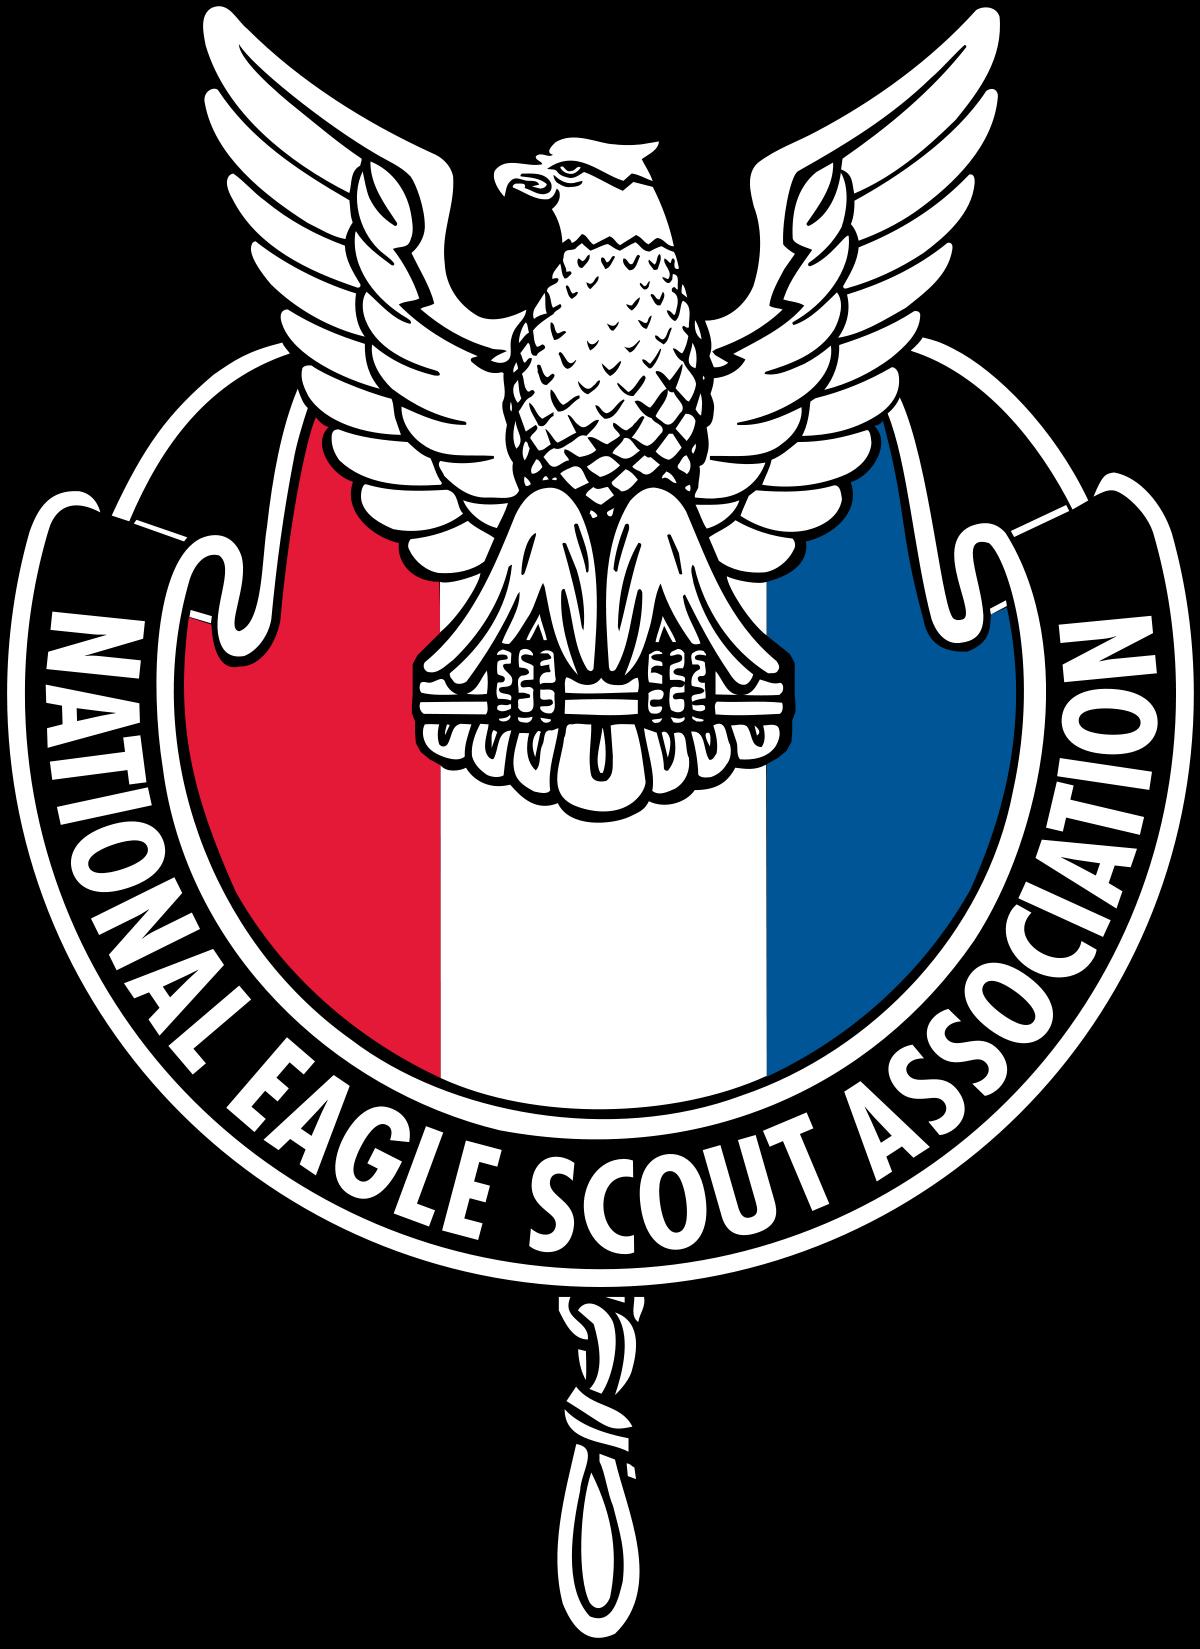 National Eagle Scout Association.